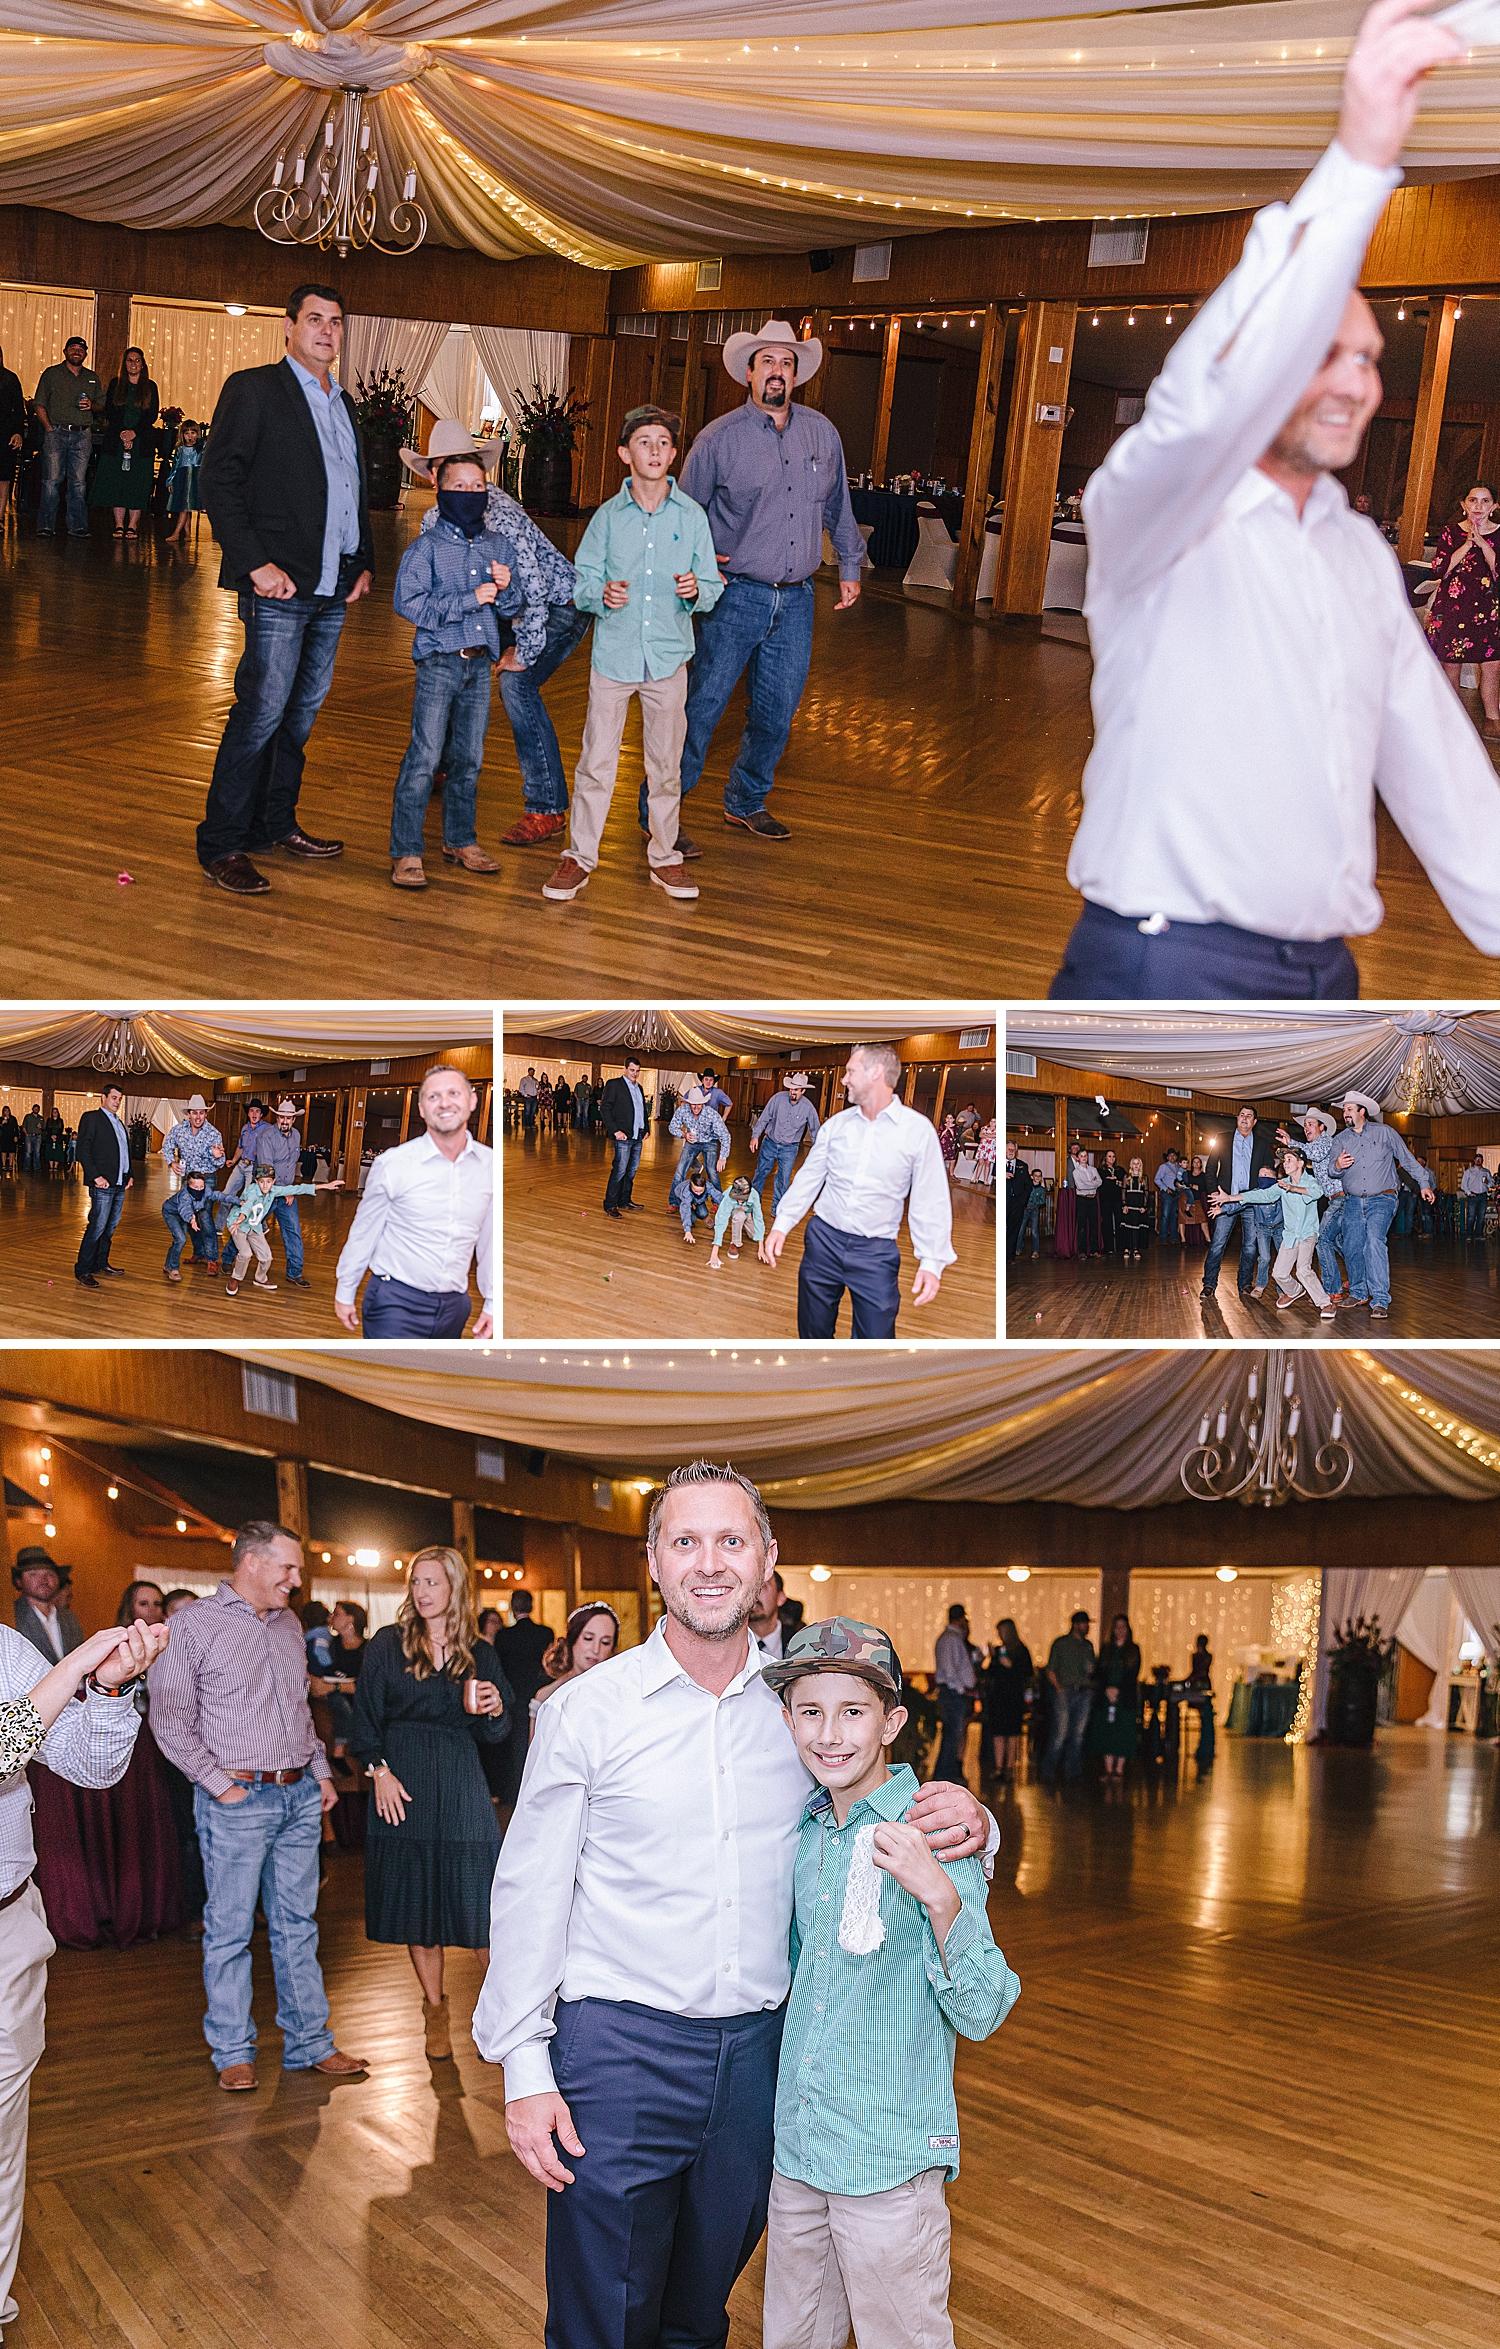 Jewel-Tone-Texas-Wedding-Valerie-Jason-Carly-Barton-Photography_0110.jpg